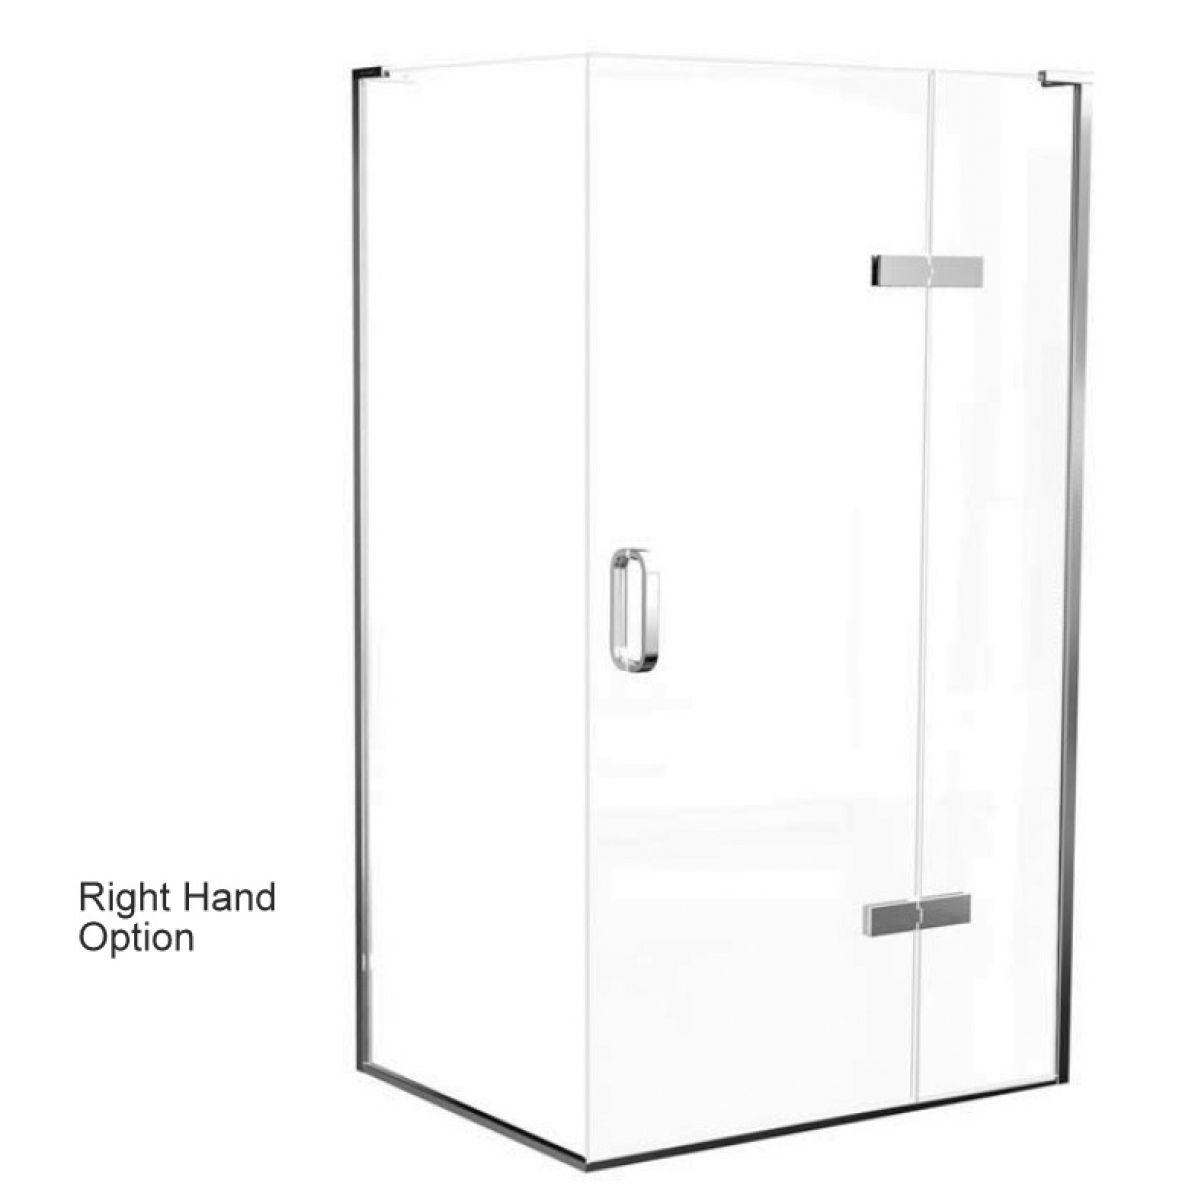 Matki Eauzone Plus Hinged Door With Hinge Panel For Corner